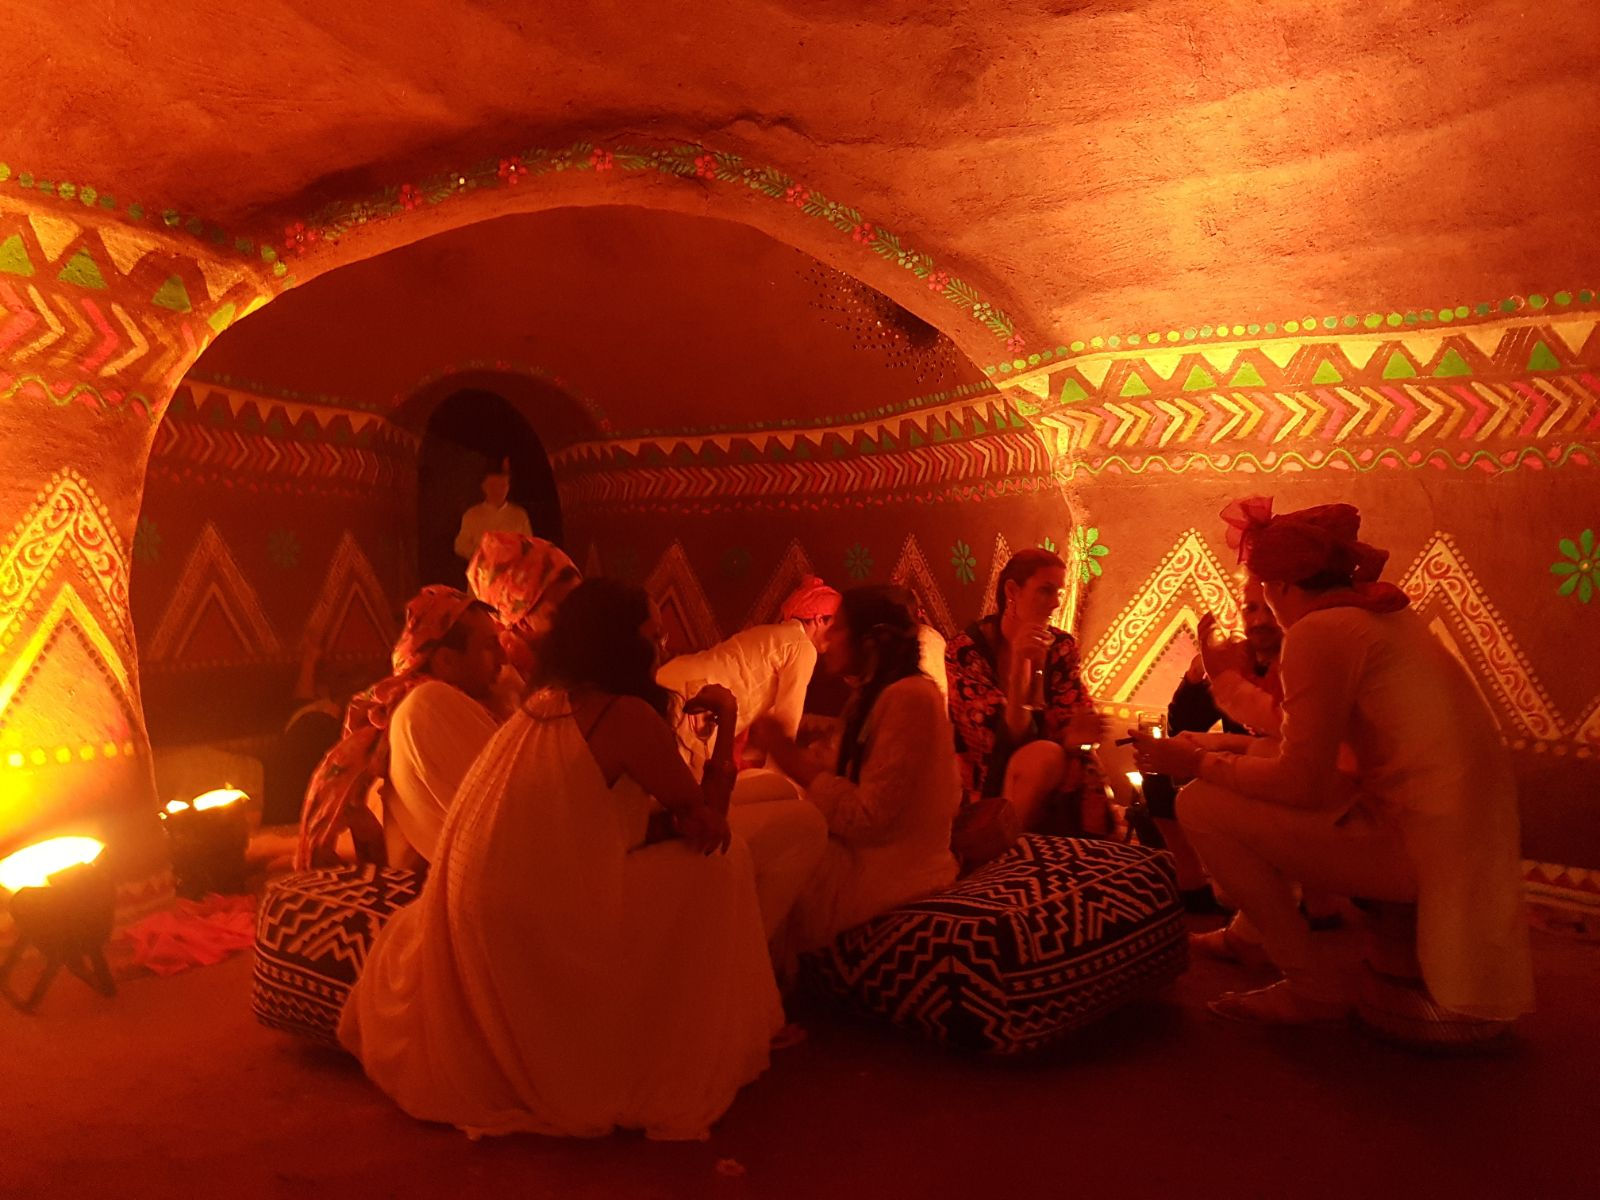 18_Dome interior at night_PC Jonathan Mizzi.jpeg